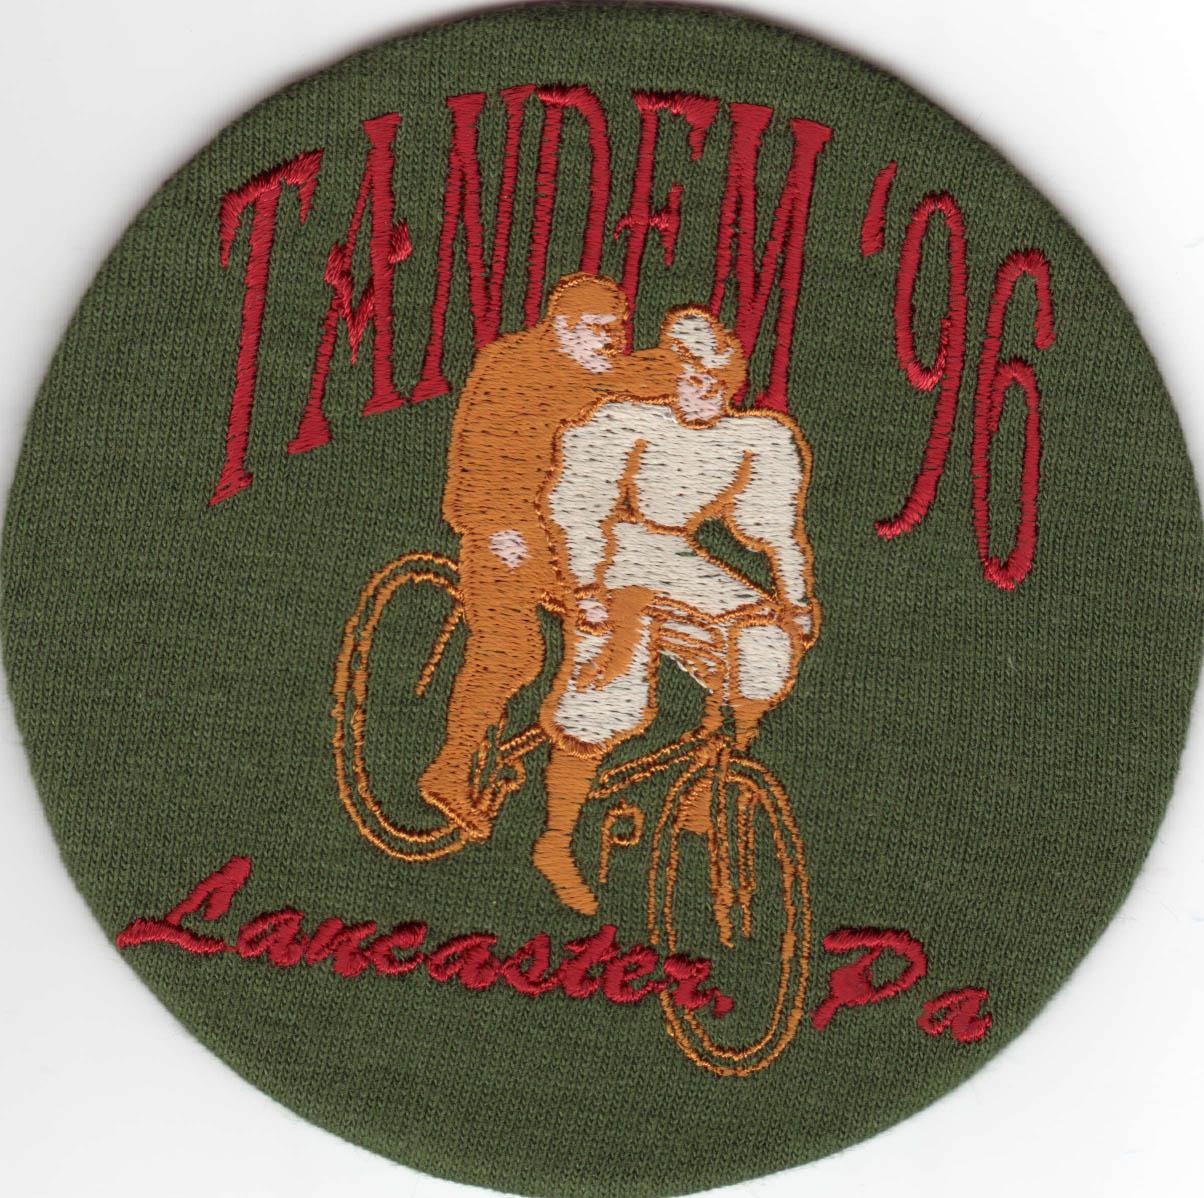 ETR 1996 Lancaster